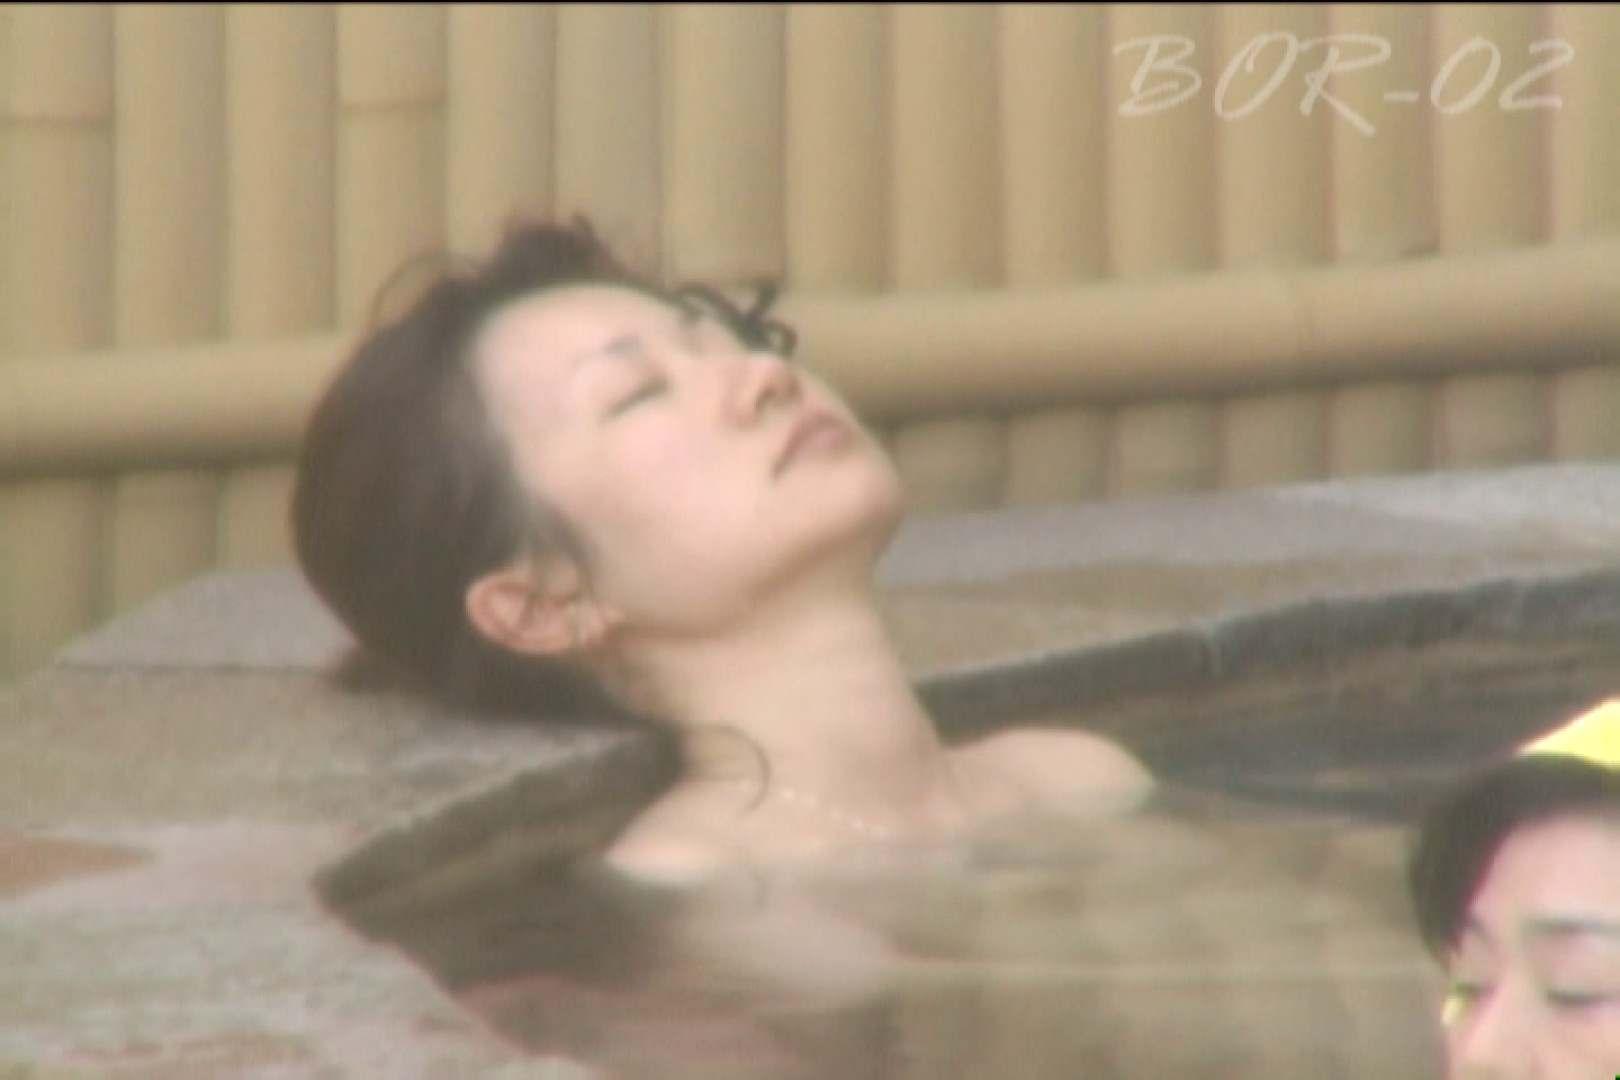 Aquaな露天風呂Vol.477 盗撮   OLエロ画像  99PICs 37